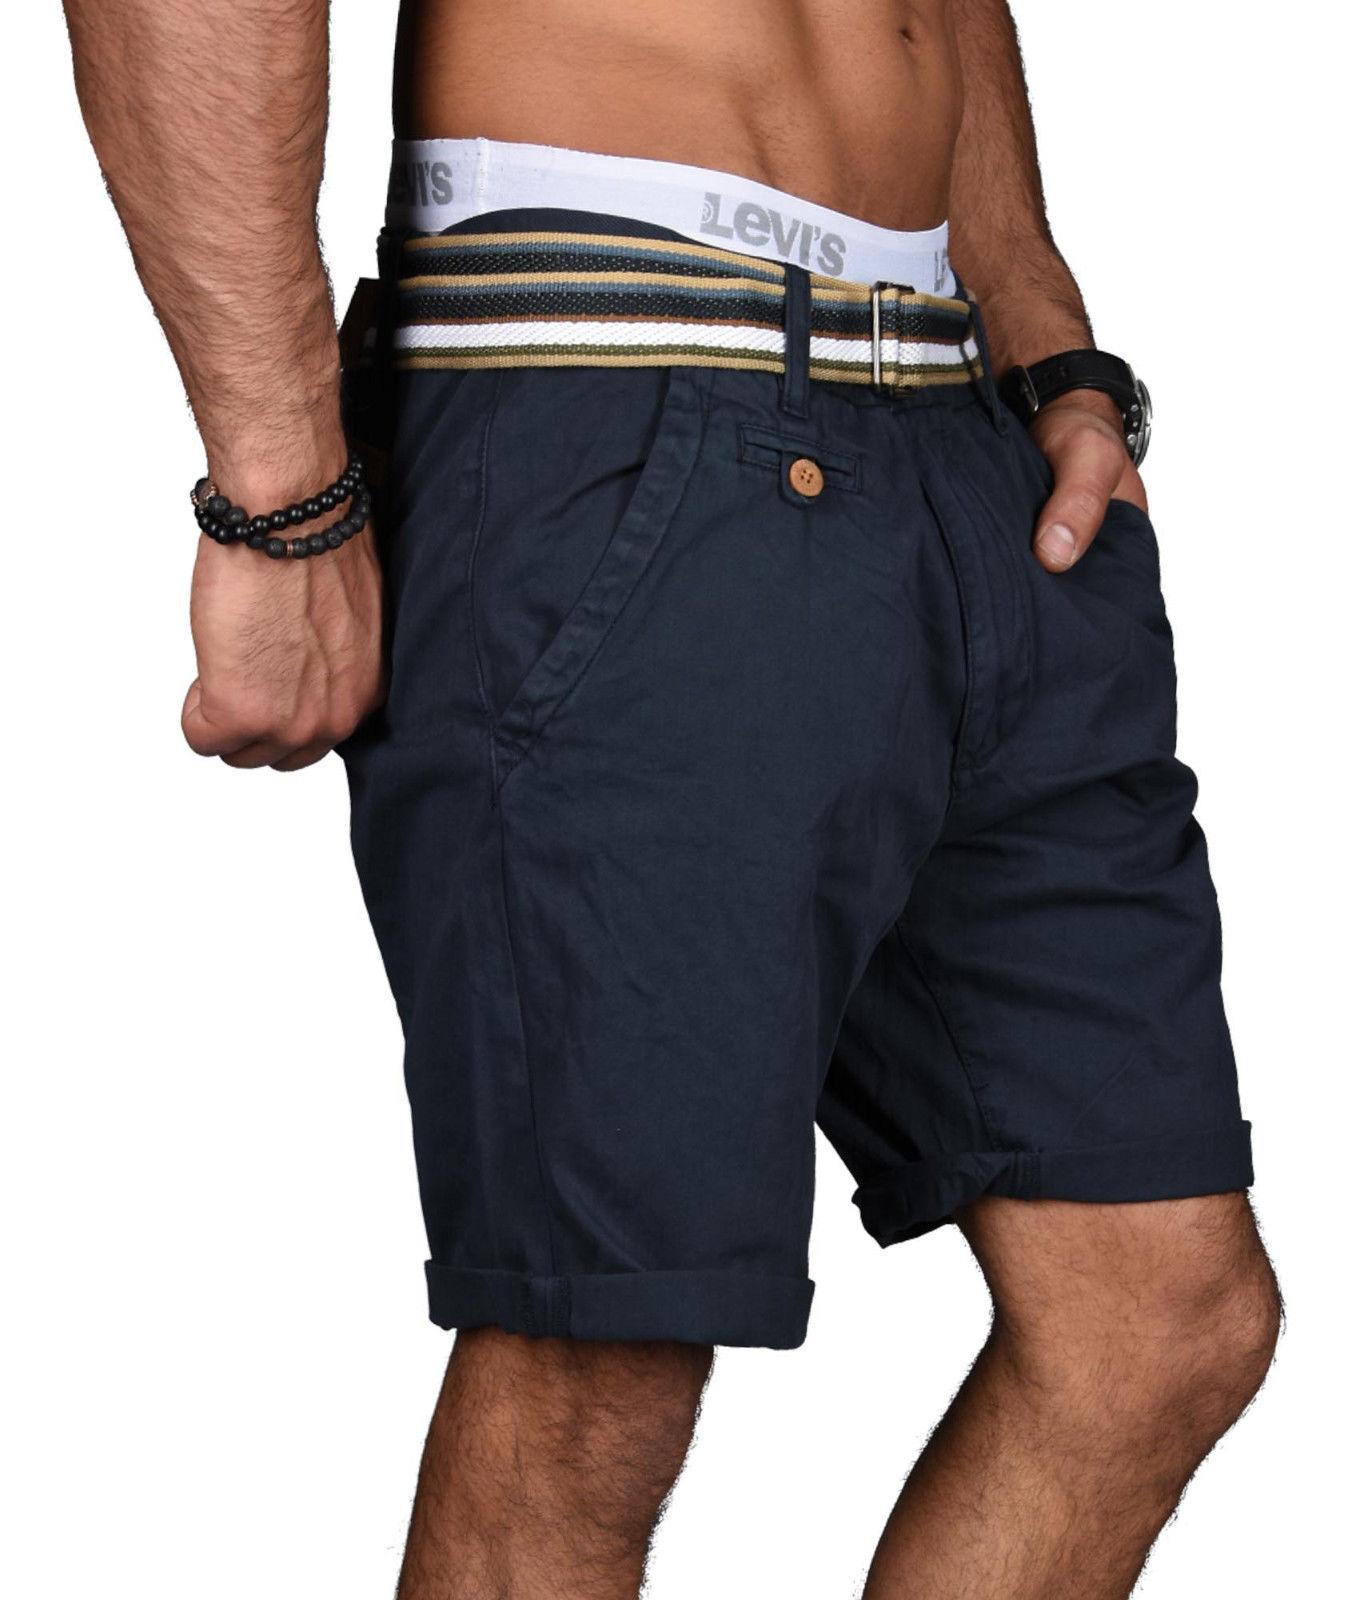 Indicode-Herren-Sommer-Bermuda-Chino-Shorts-kurze-Hose-Sommerhose-Short-NEU-B499 Indexbild 15